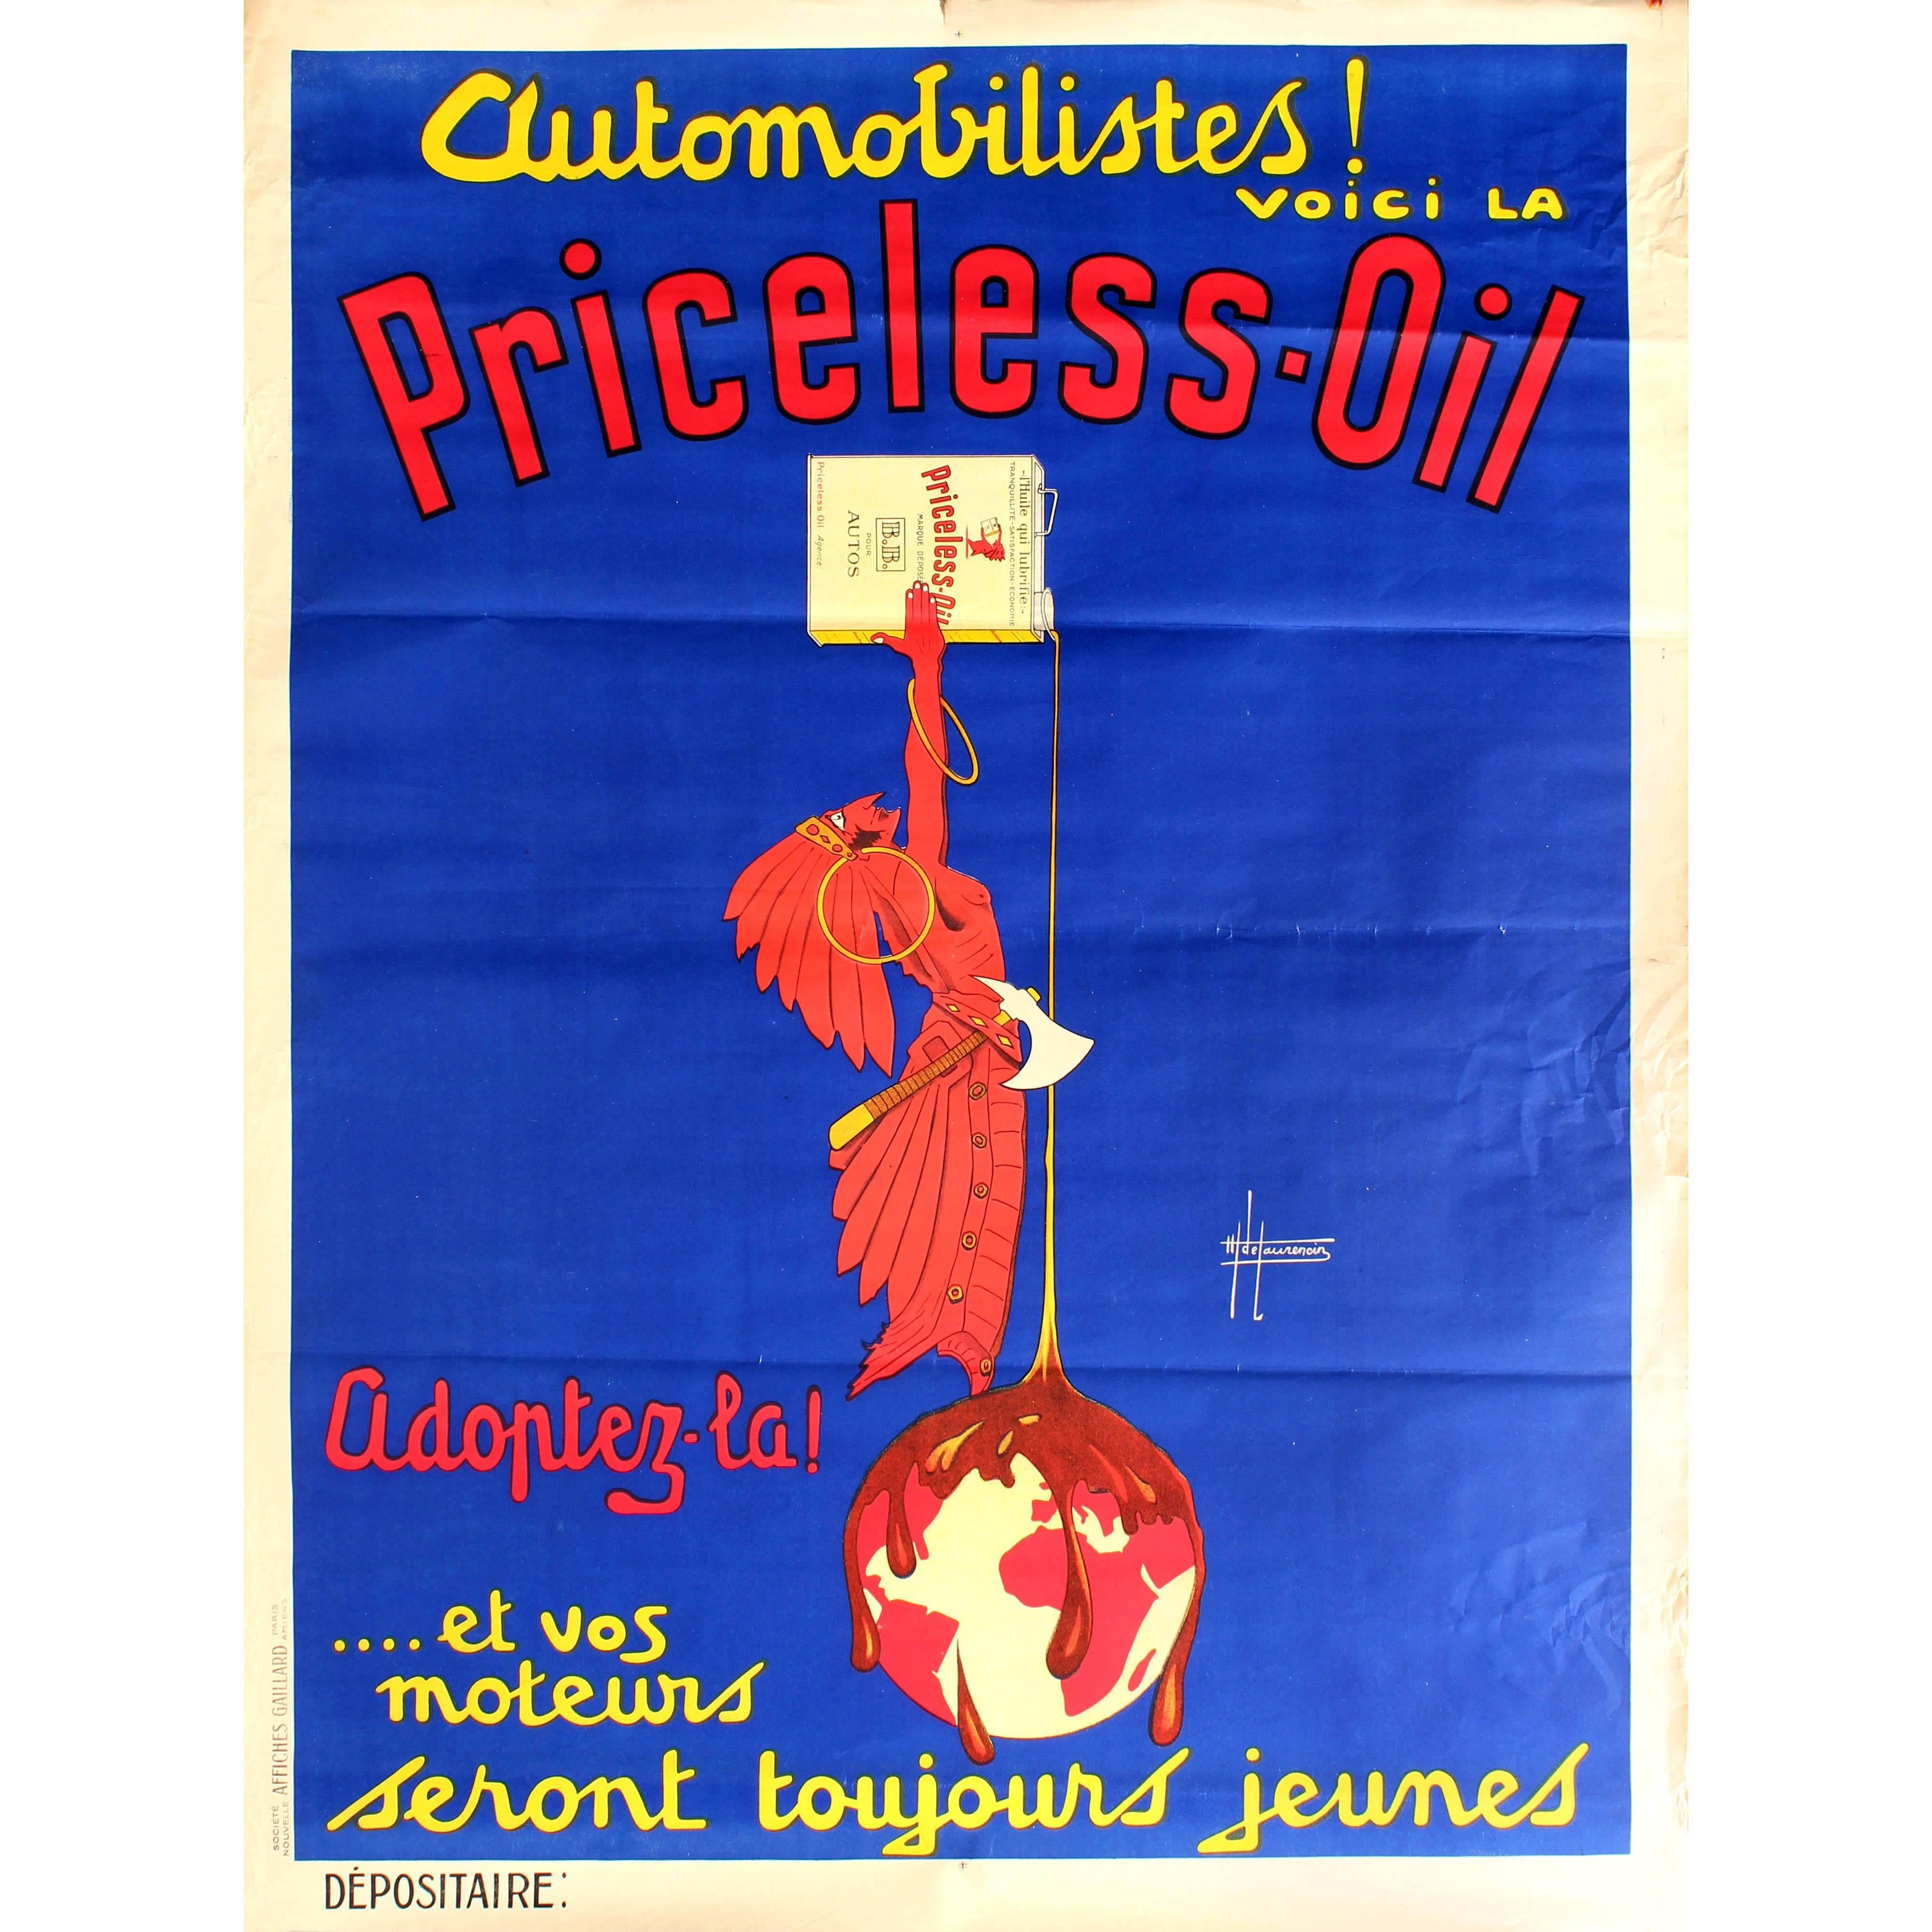 Large Original Vintage Art Deco Automobile Advertising Poster for Priceless Oil